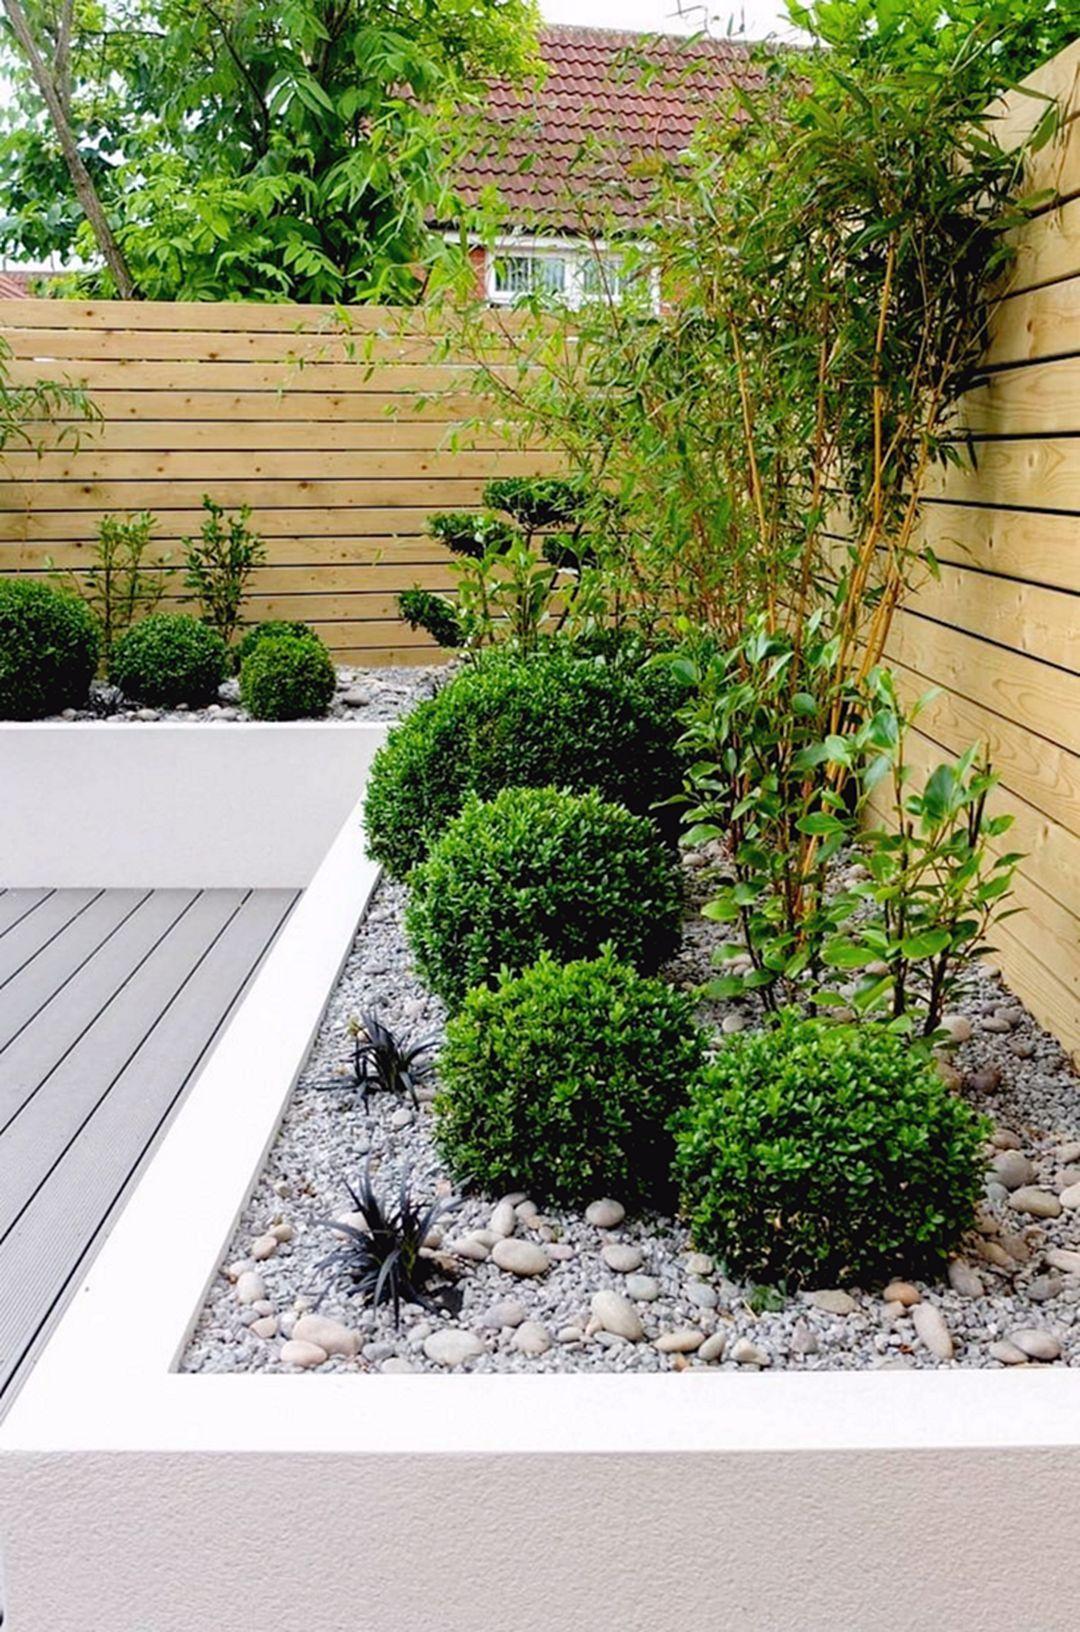 9 Aesthetically And Easy Maintenance Garden Ideas In 2020 Low Maintenance Garden Design Minimalist Garden Small Backyard Design